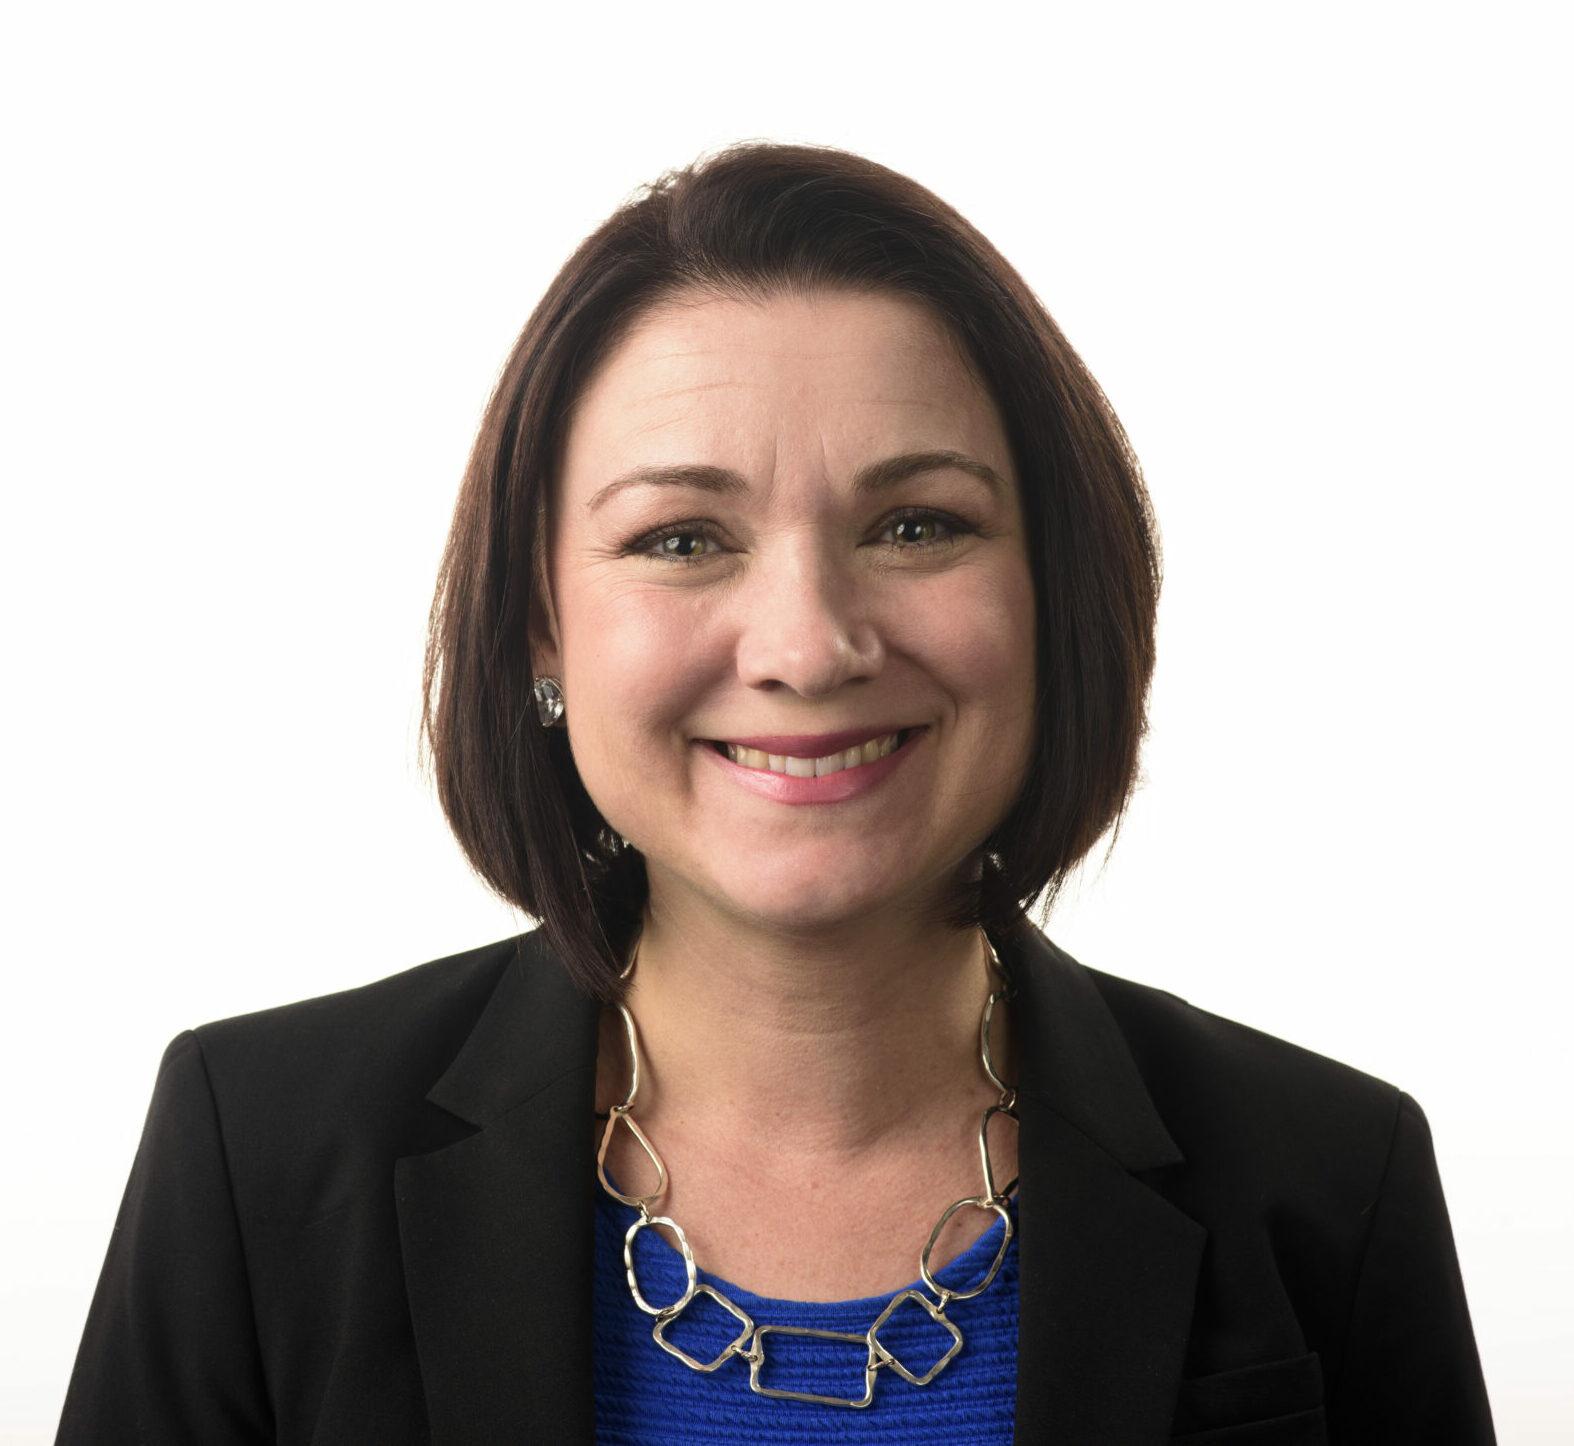 Portrait of Tamara Keith.